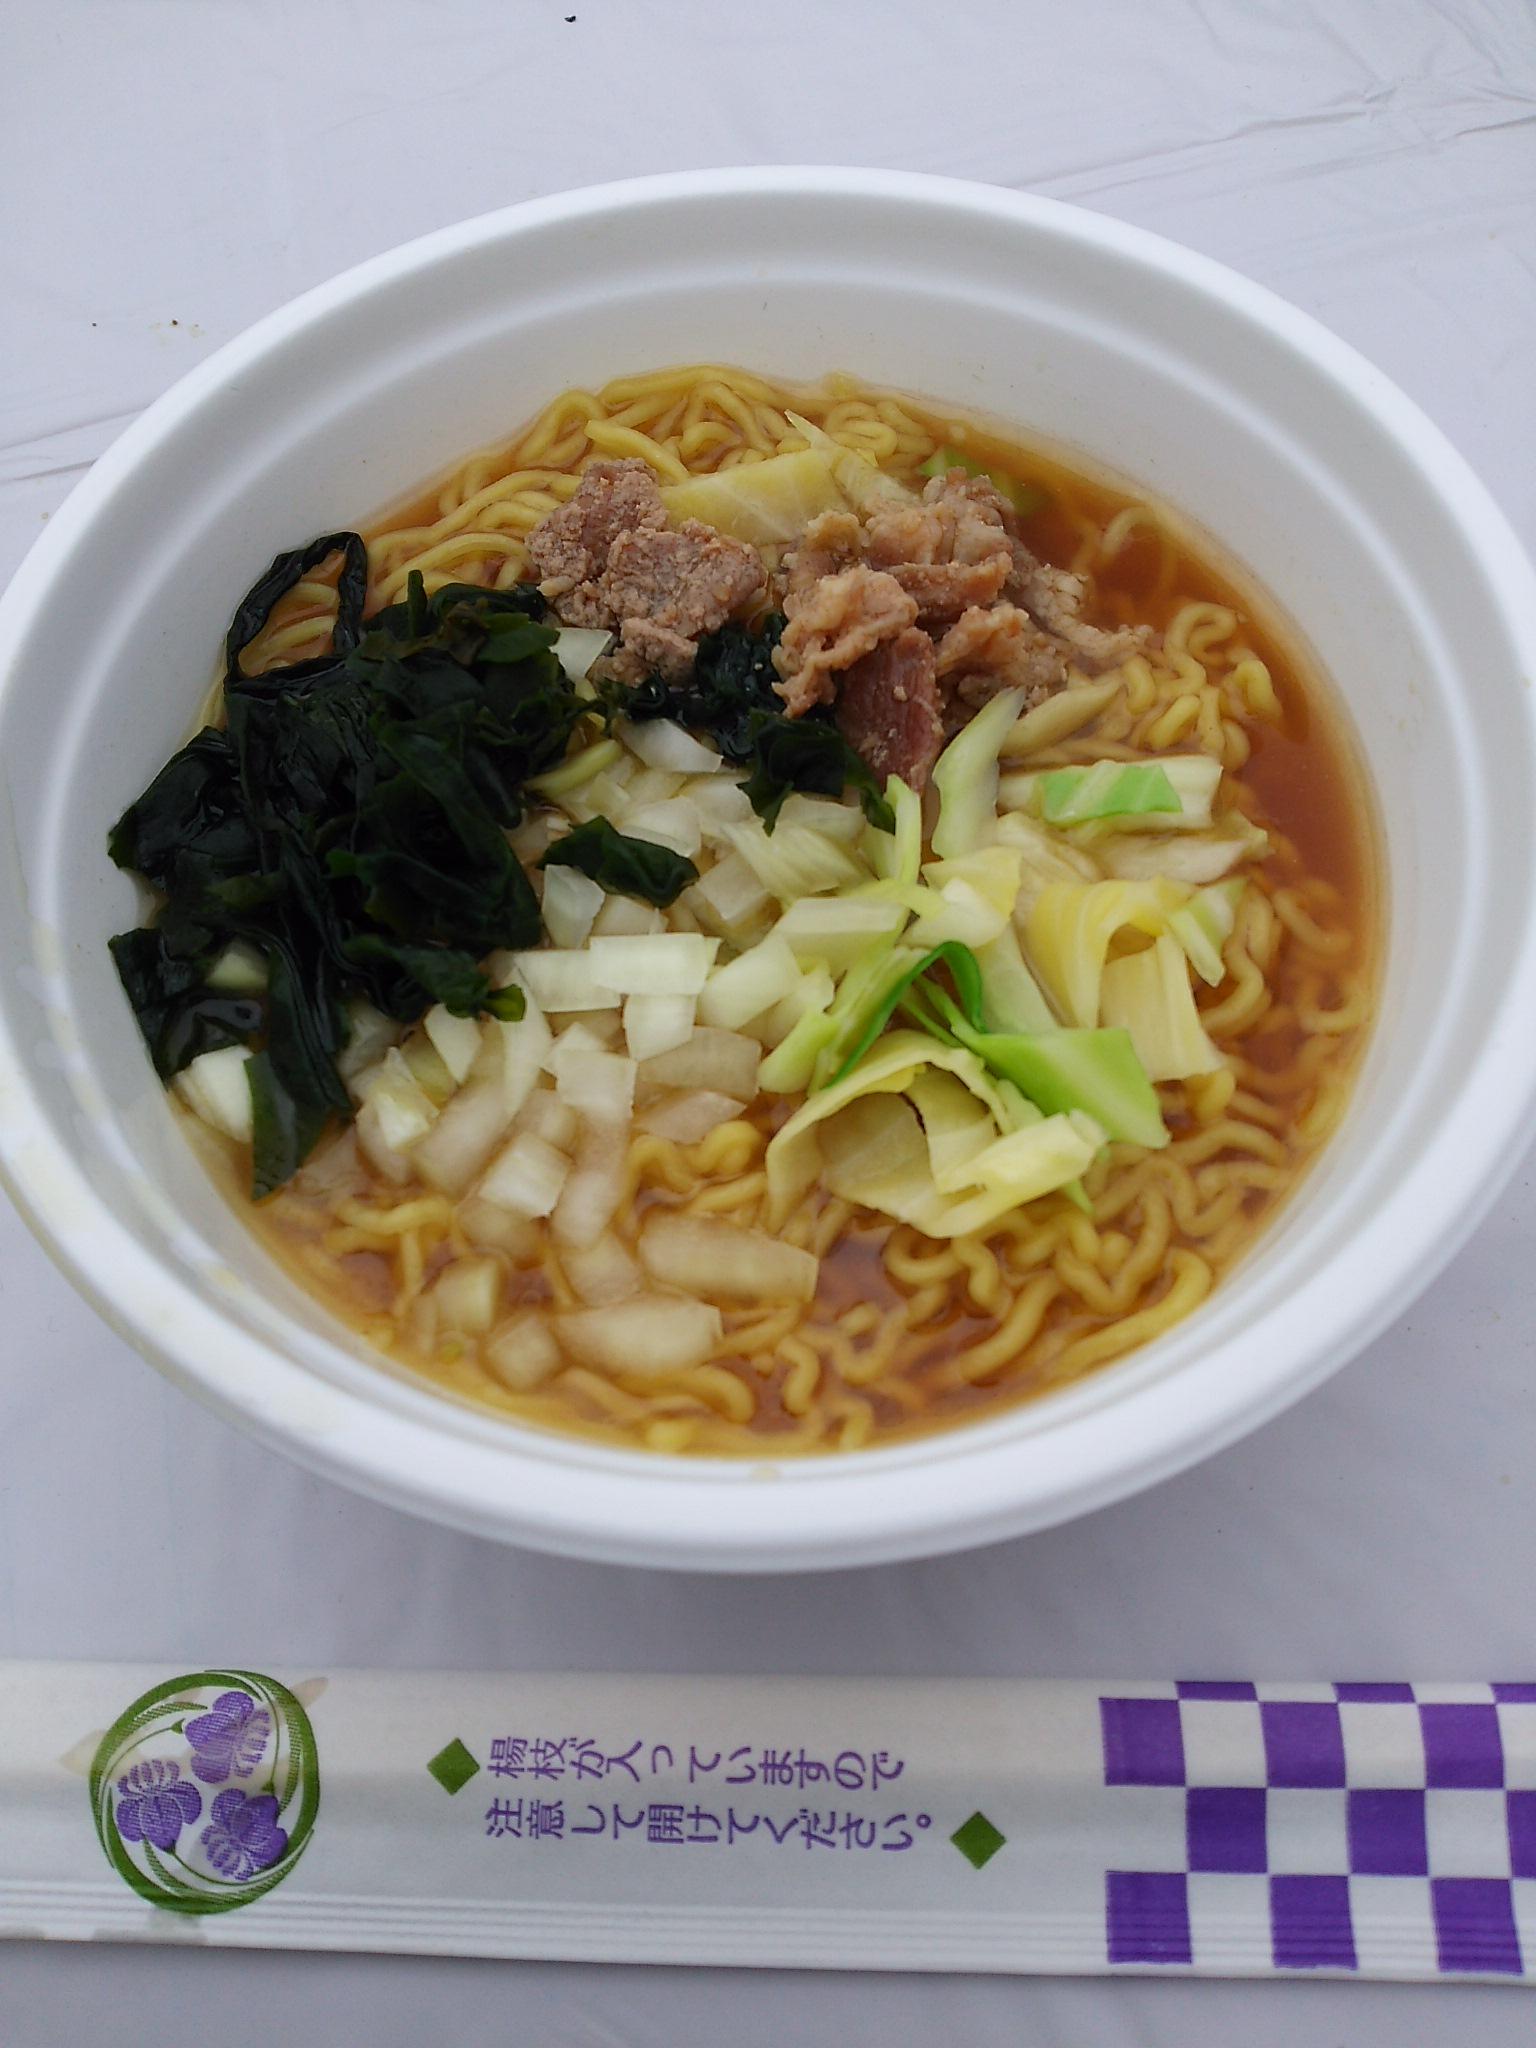 http://www.yamanashi-kankou.jp/blog/DSC_0034.JPG